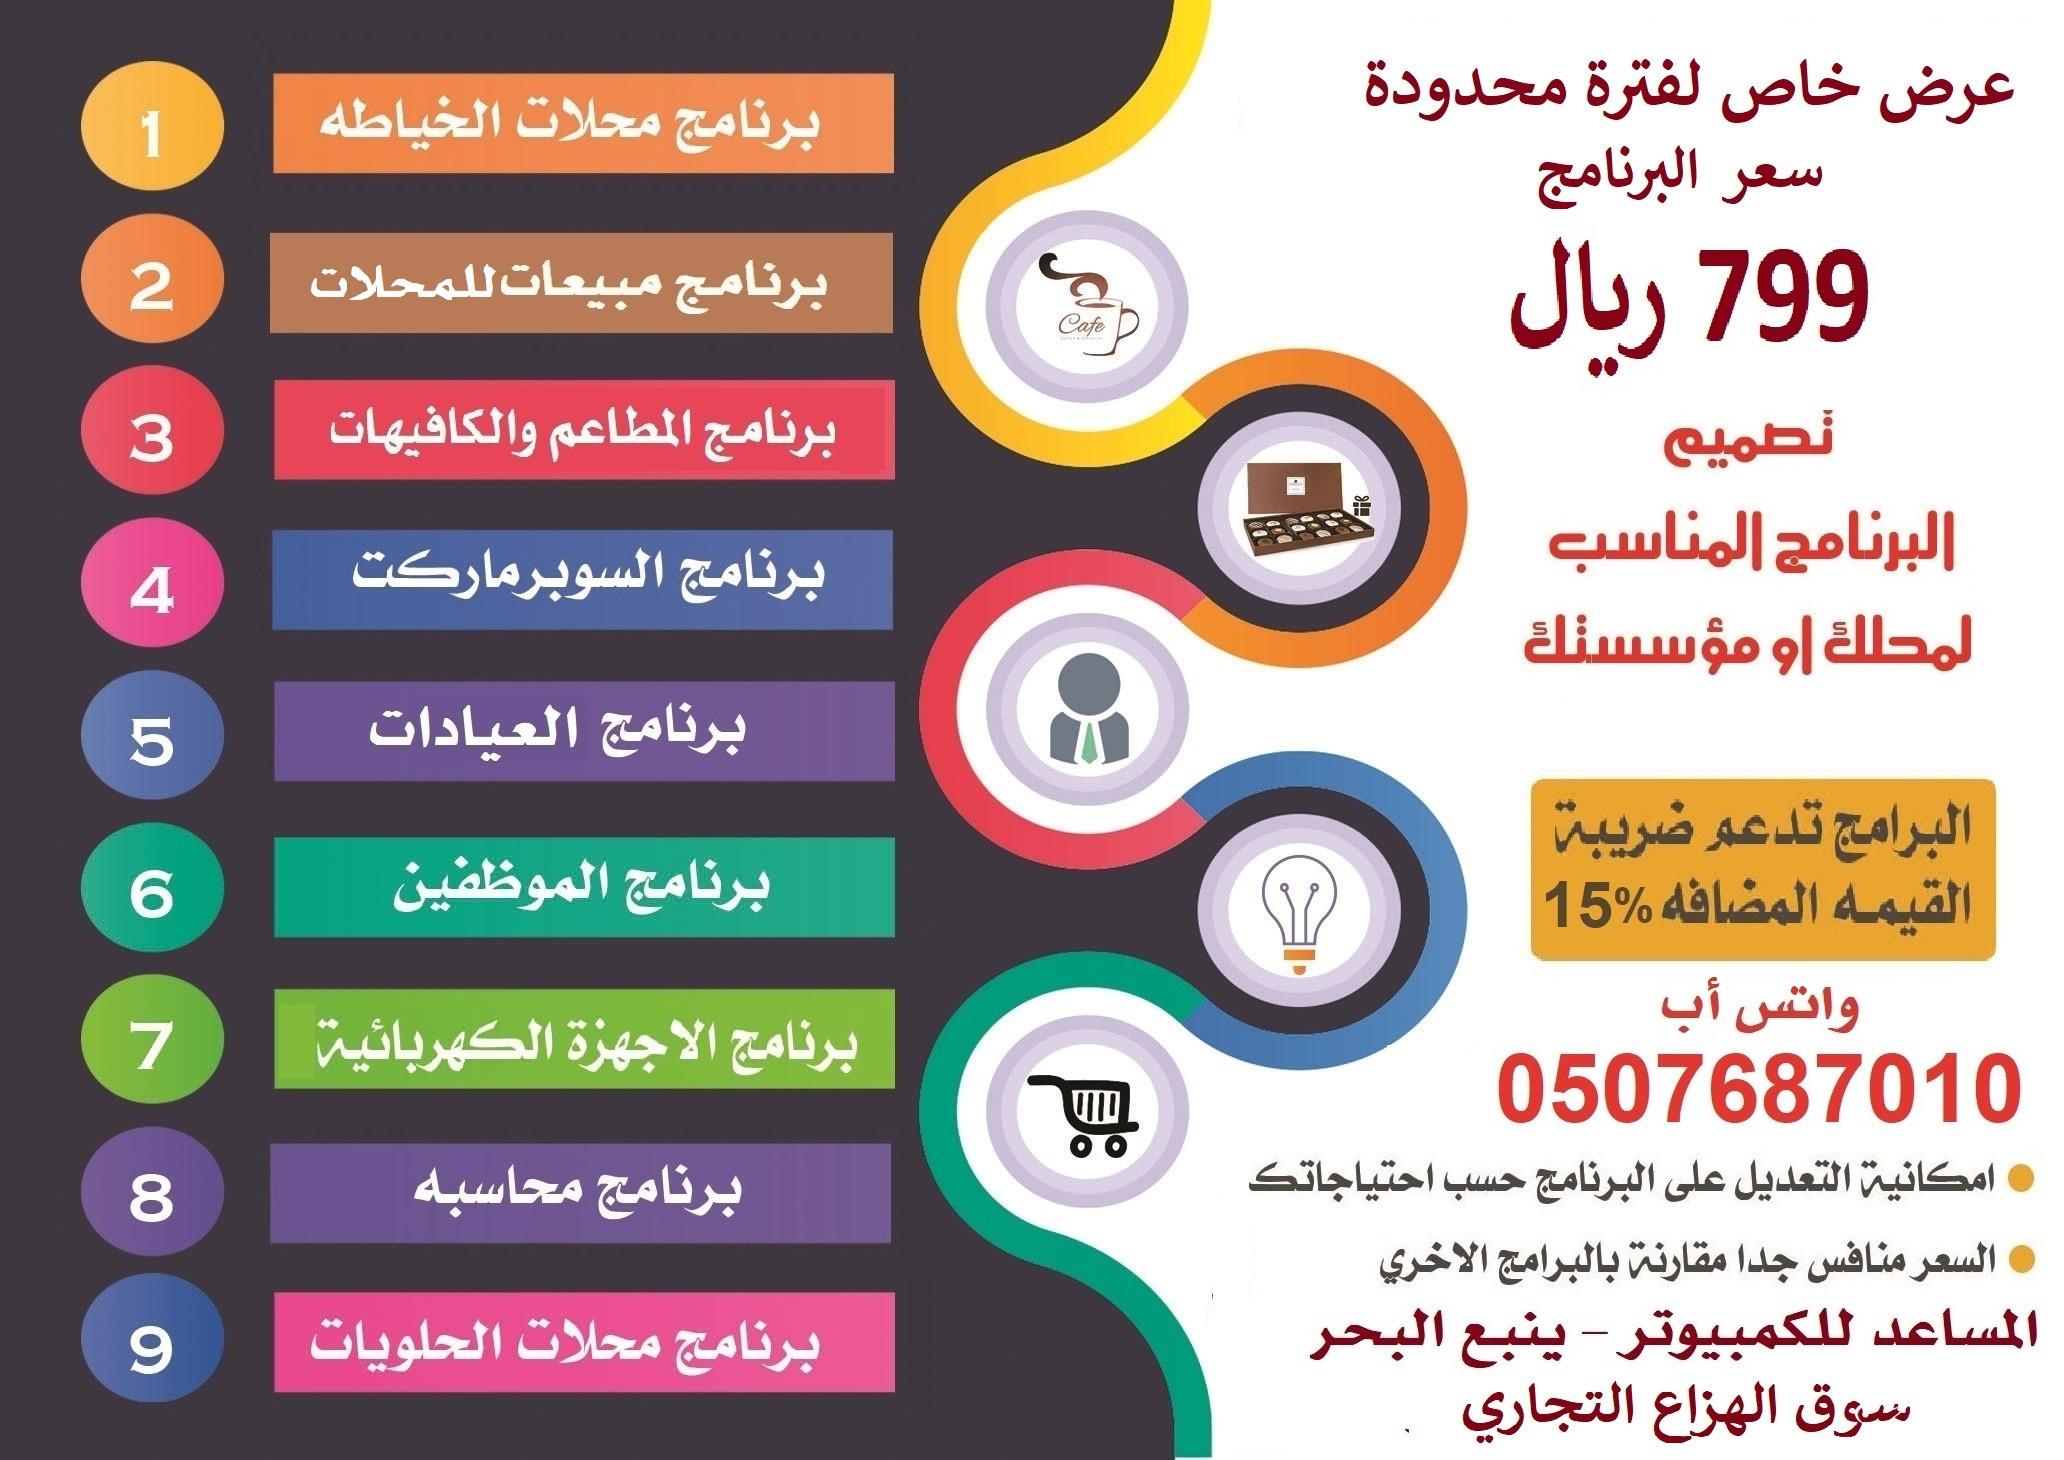 برامج للمحلات والمؤسسات واتس 0507687010